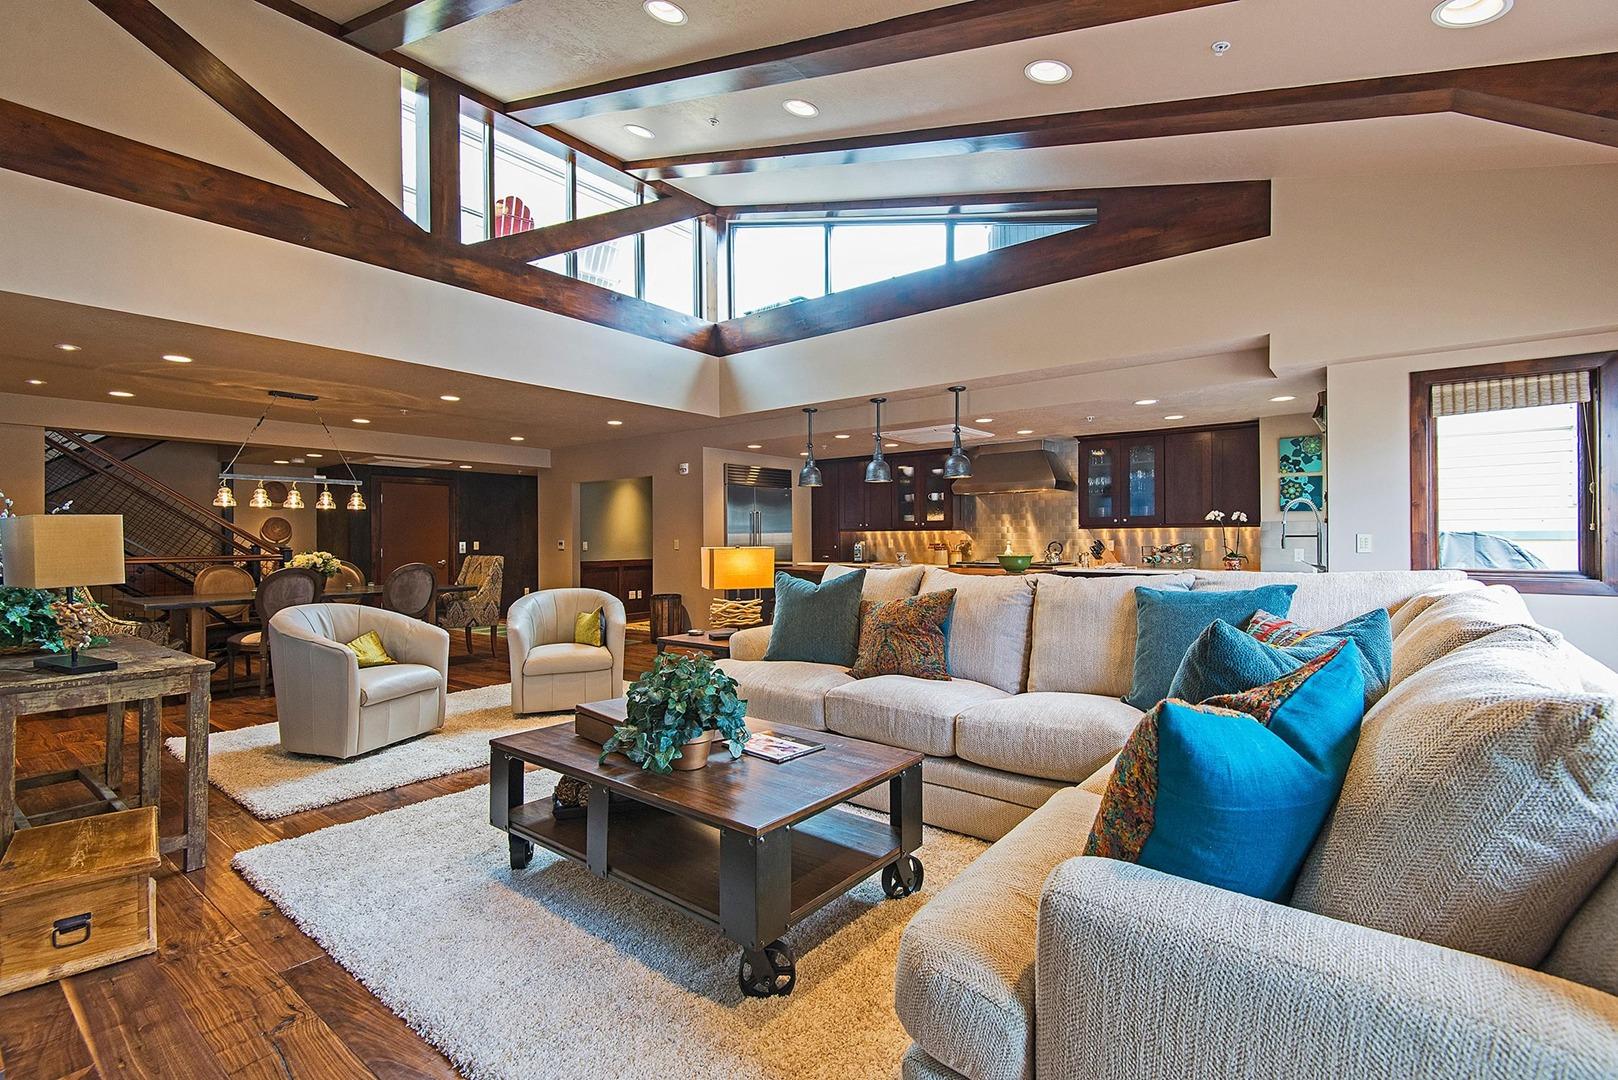 Luxury Custom Homes - Customs homes designs